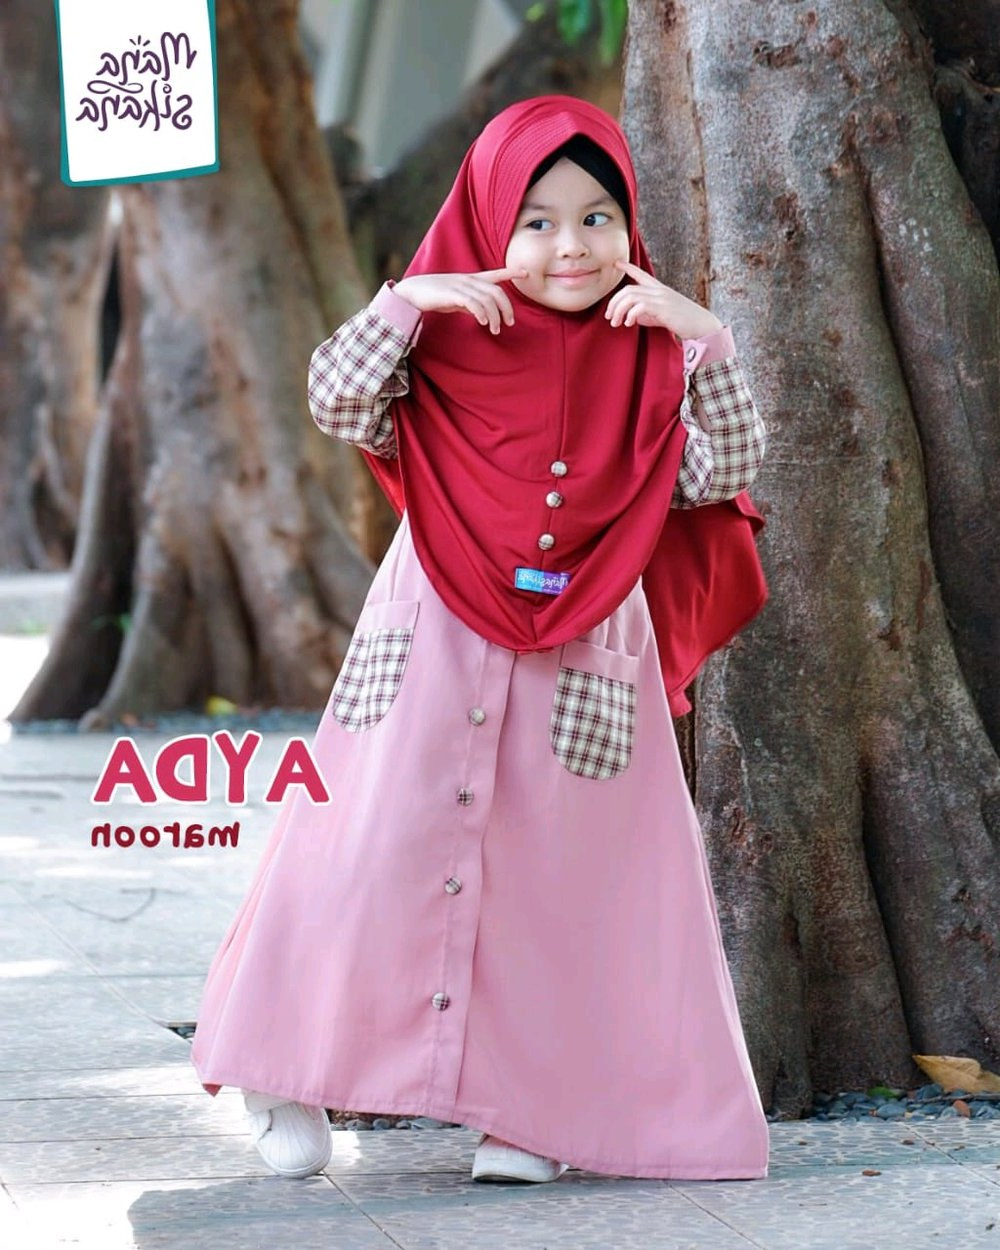 Design Baju Pengantin Adat Jawa Muslim D0dg Tangga Elektronik 1111